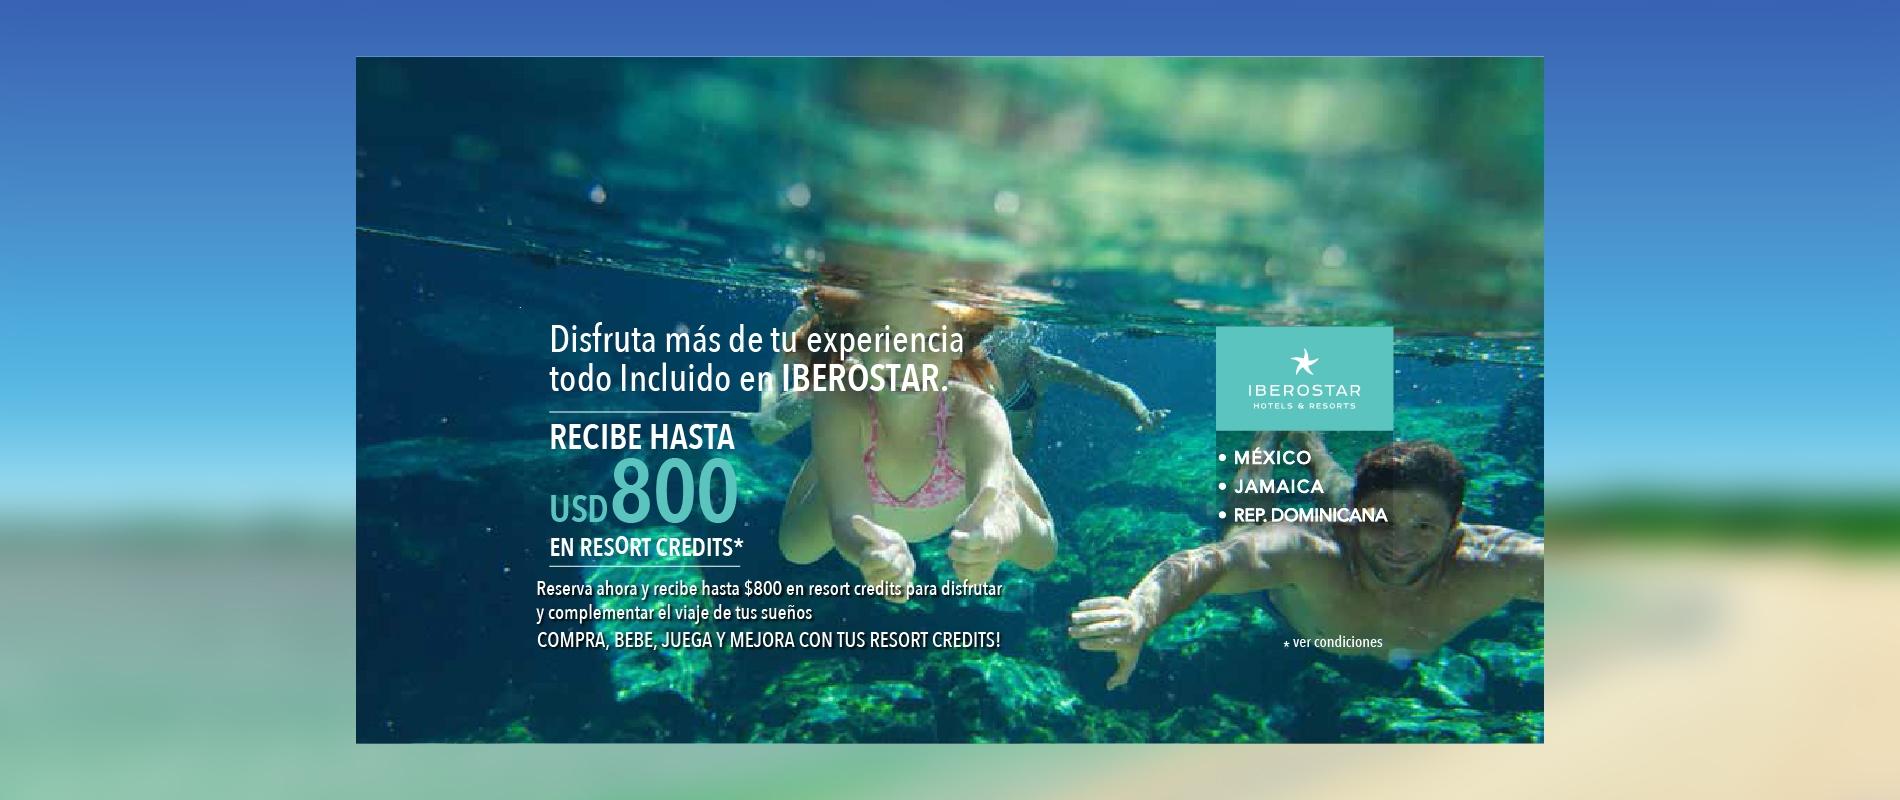 resorts credit iberostar